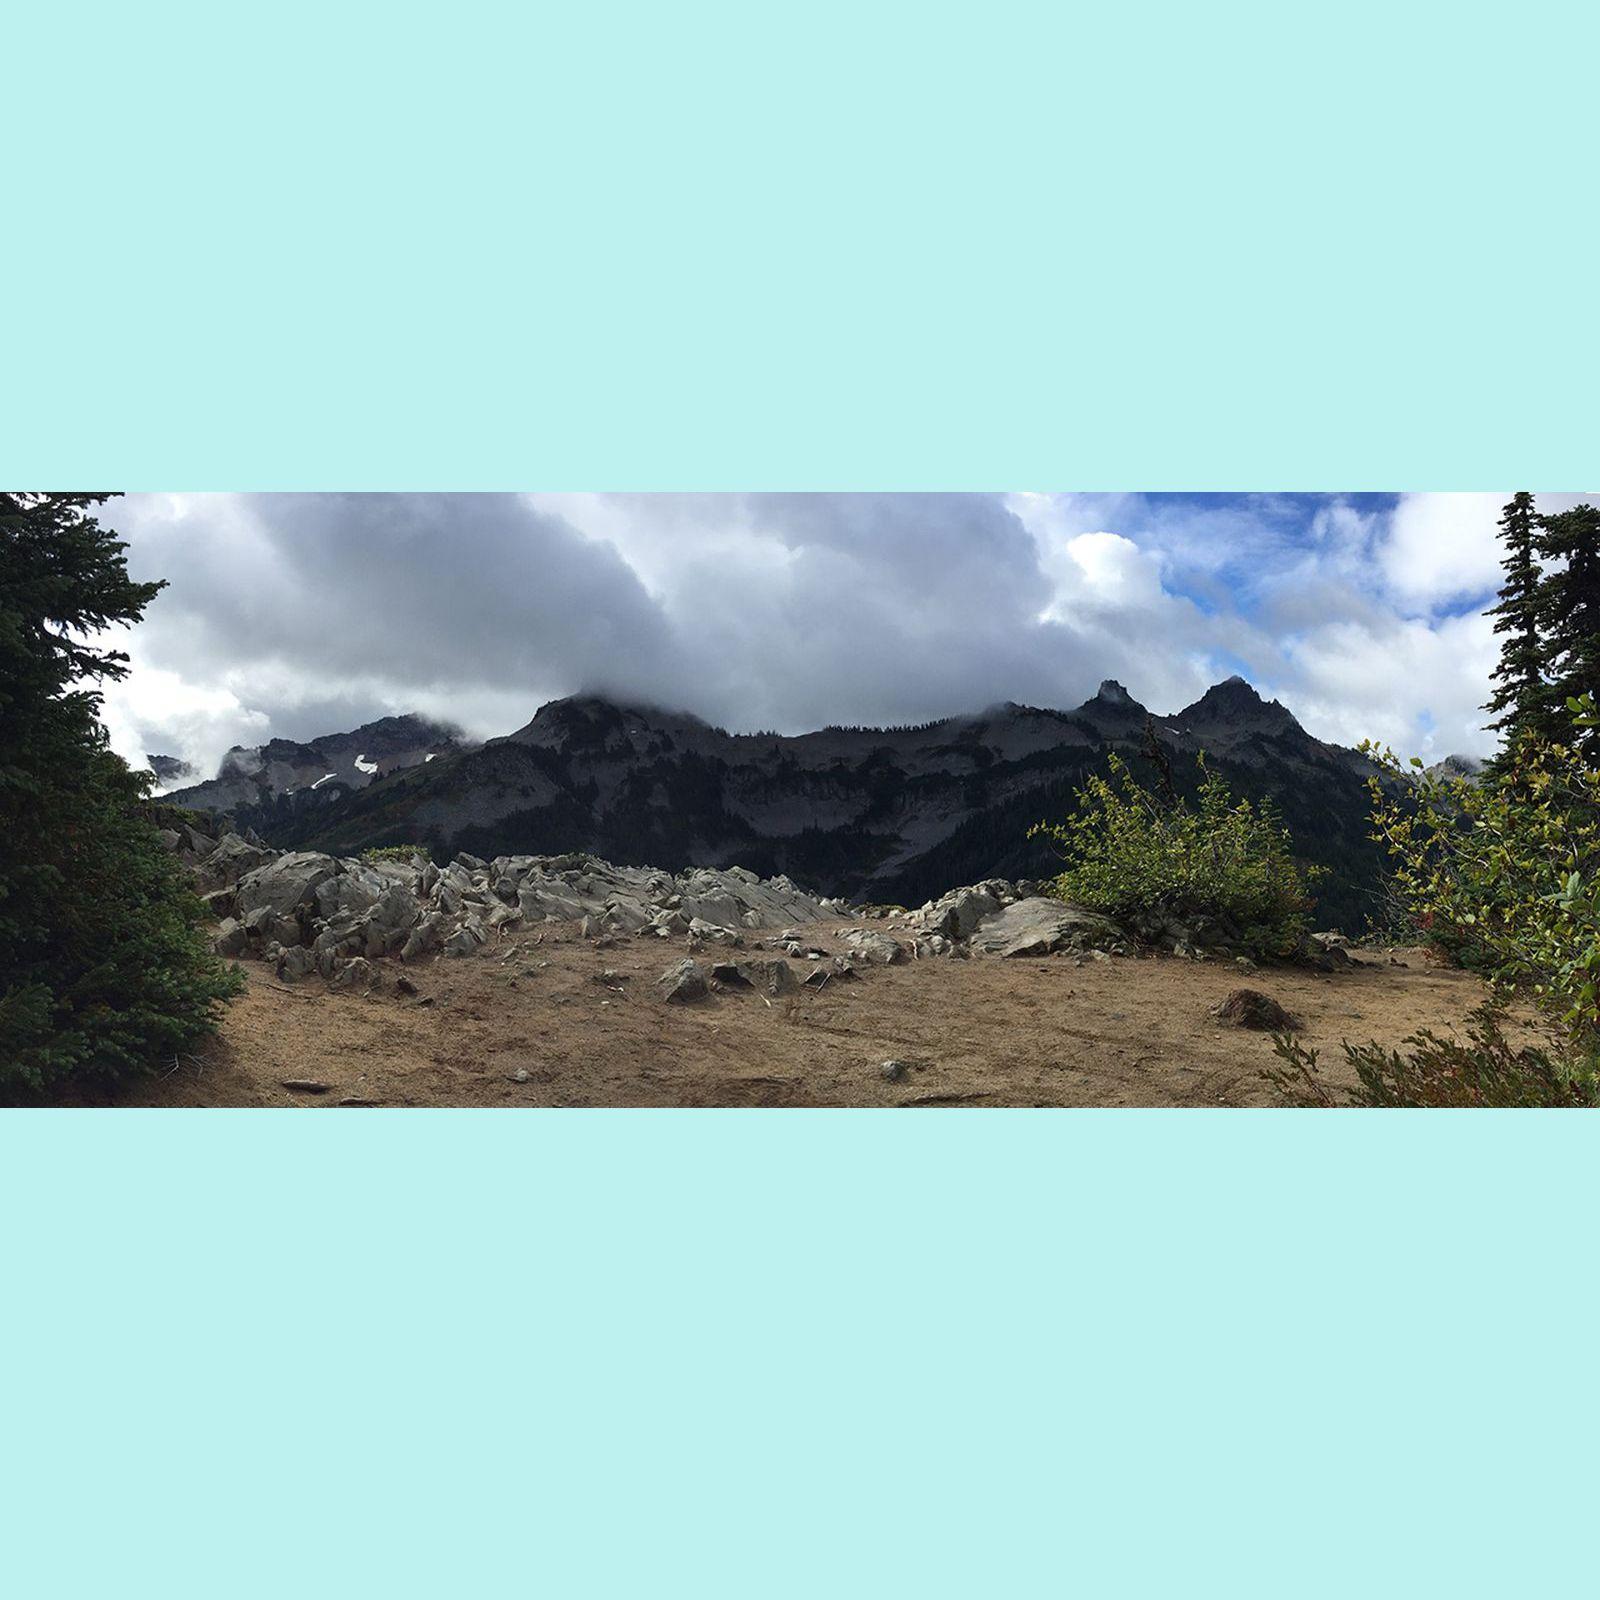 Gary_090_Untitled_Panorama1-E1x.jpg